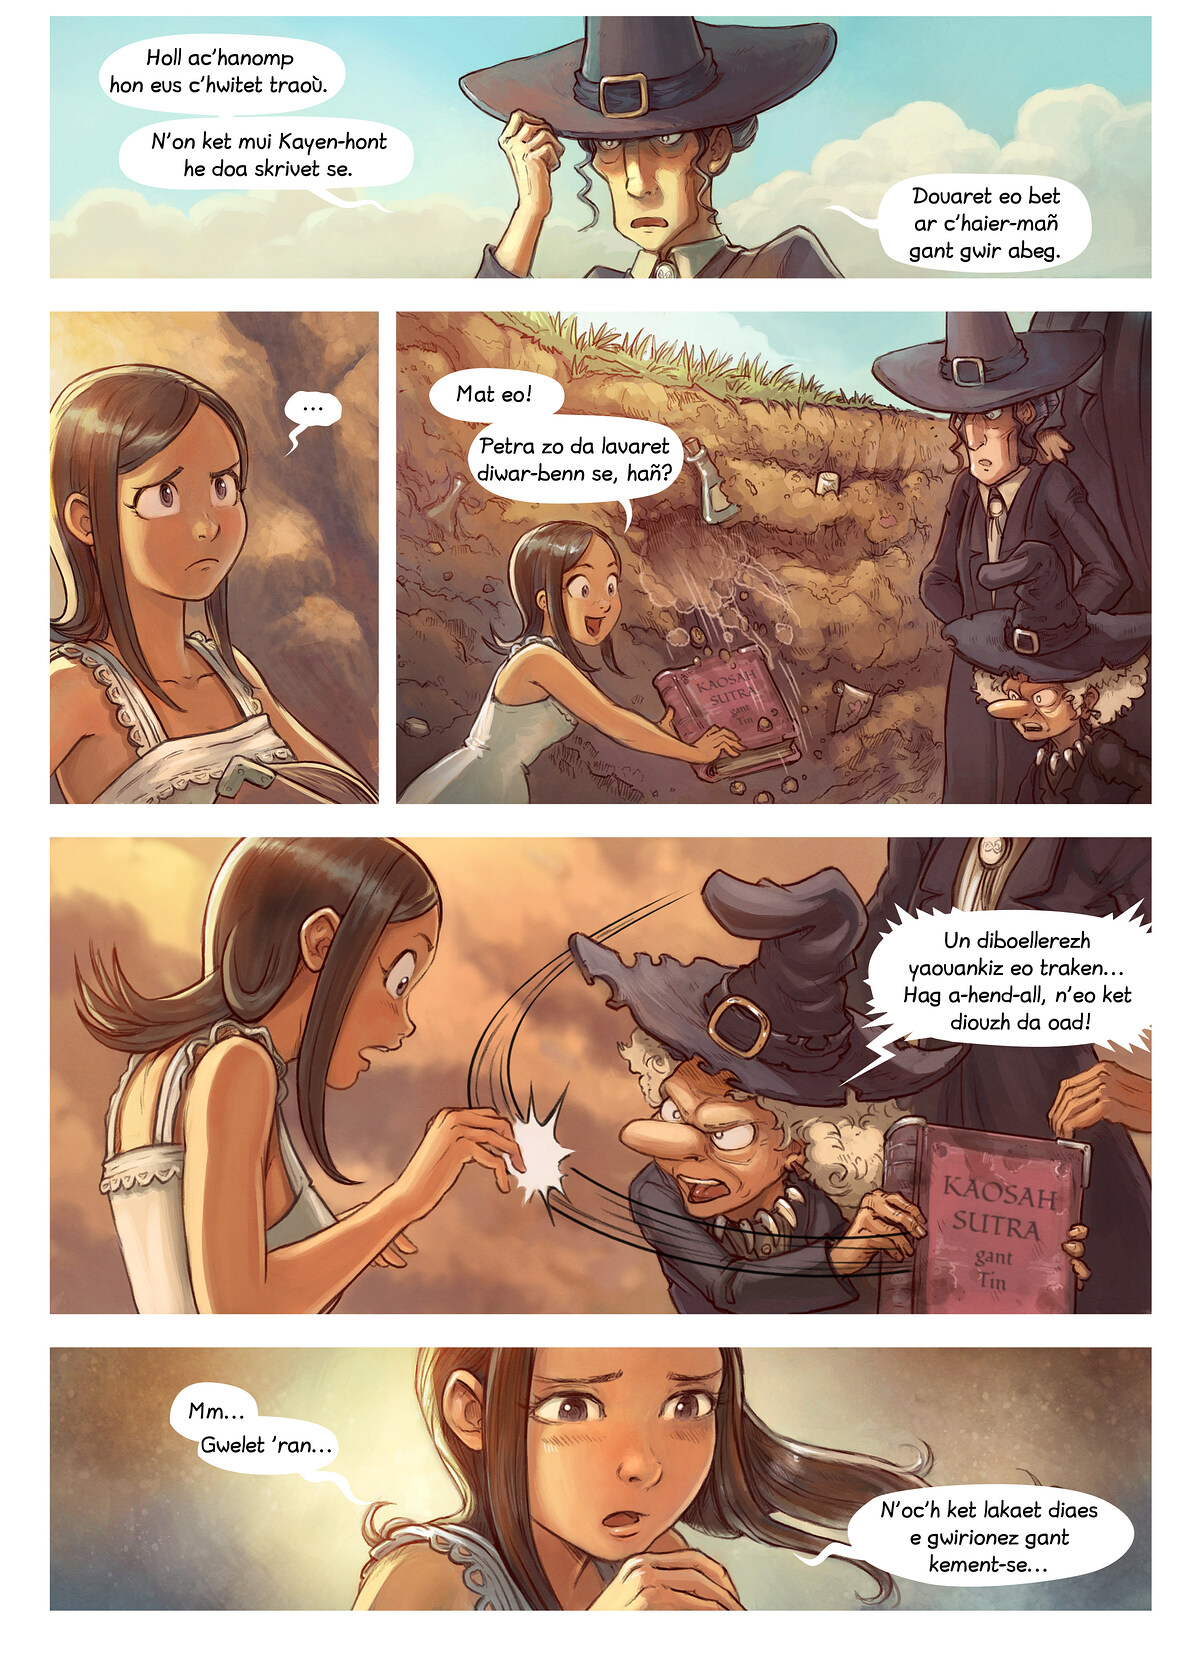 A webcomic page of Pepper&Carrot, rann 19 [br], pajenn 5